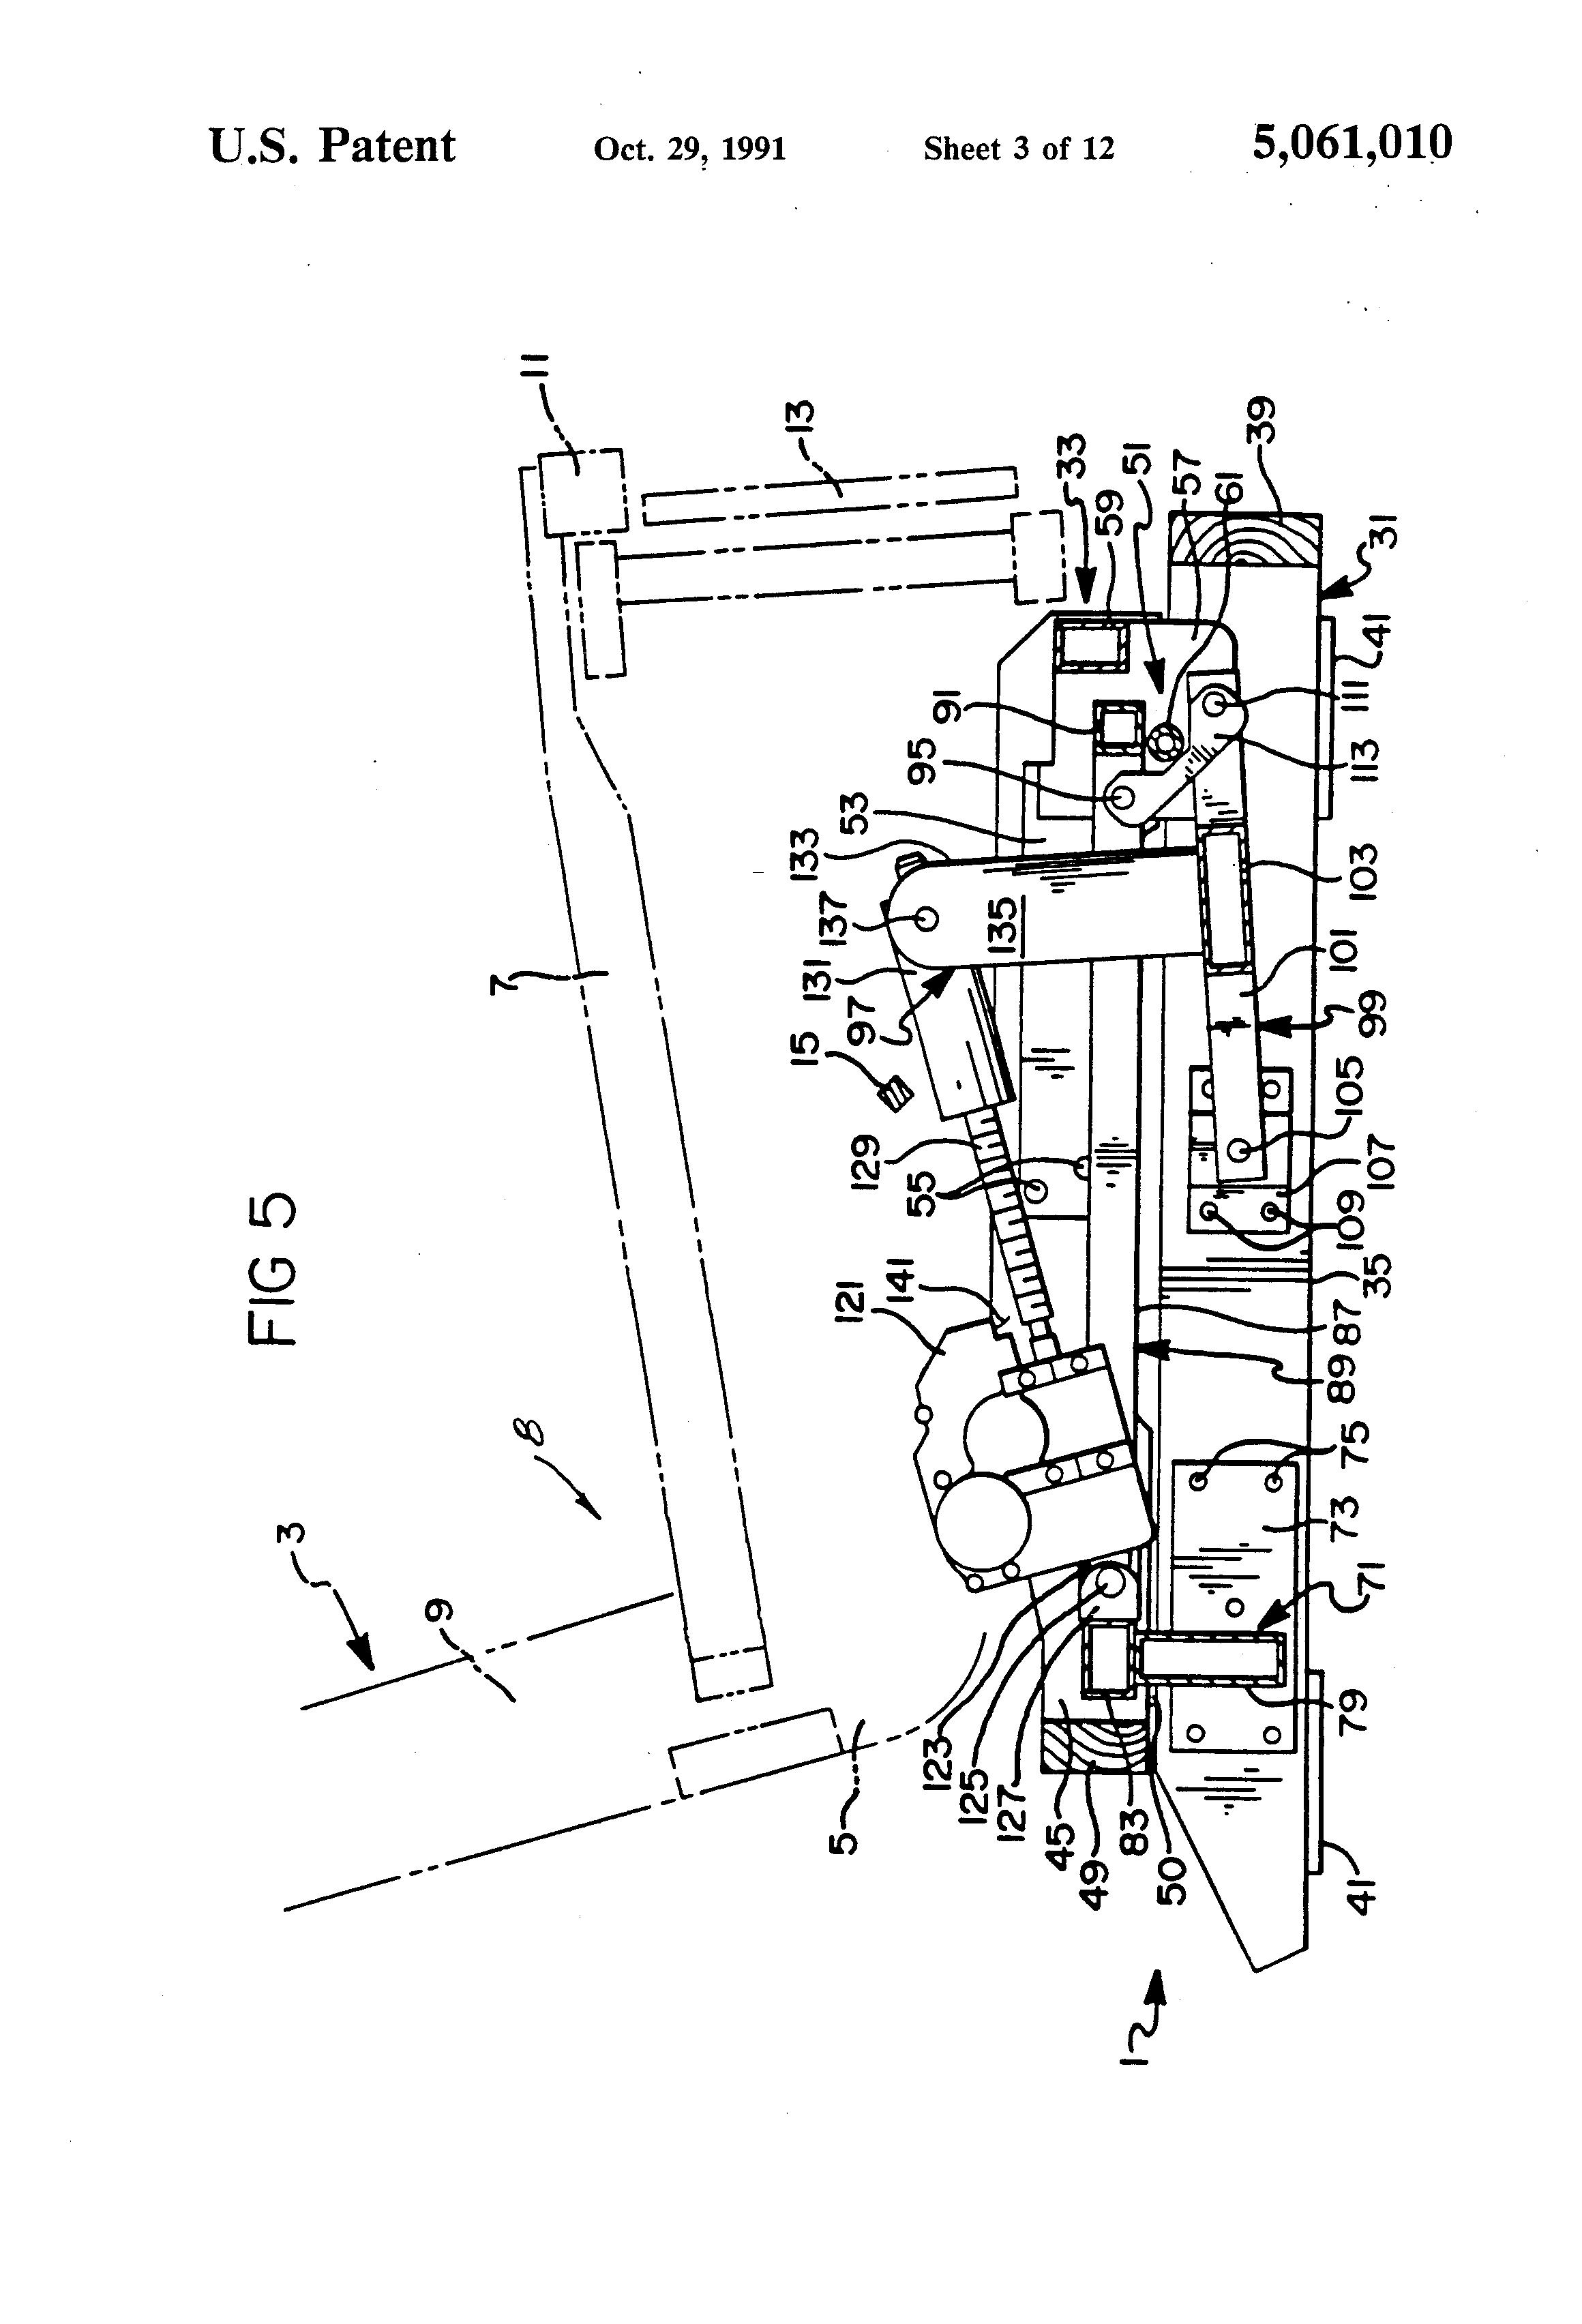 hc 2802 gt3 recliner remote wiring diagram chevy truck wiring diagram chevy truck wiring diagram chevy truck wiring diagram chevy truck wiring diagram